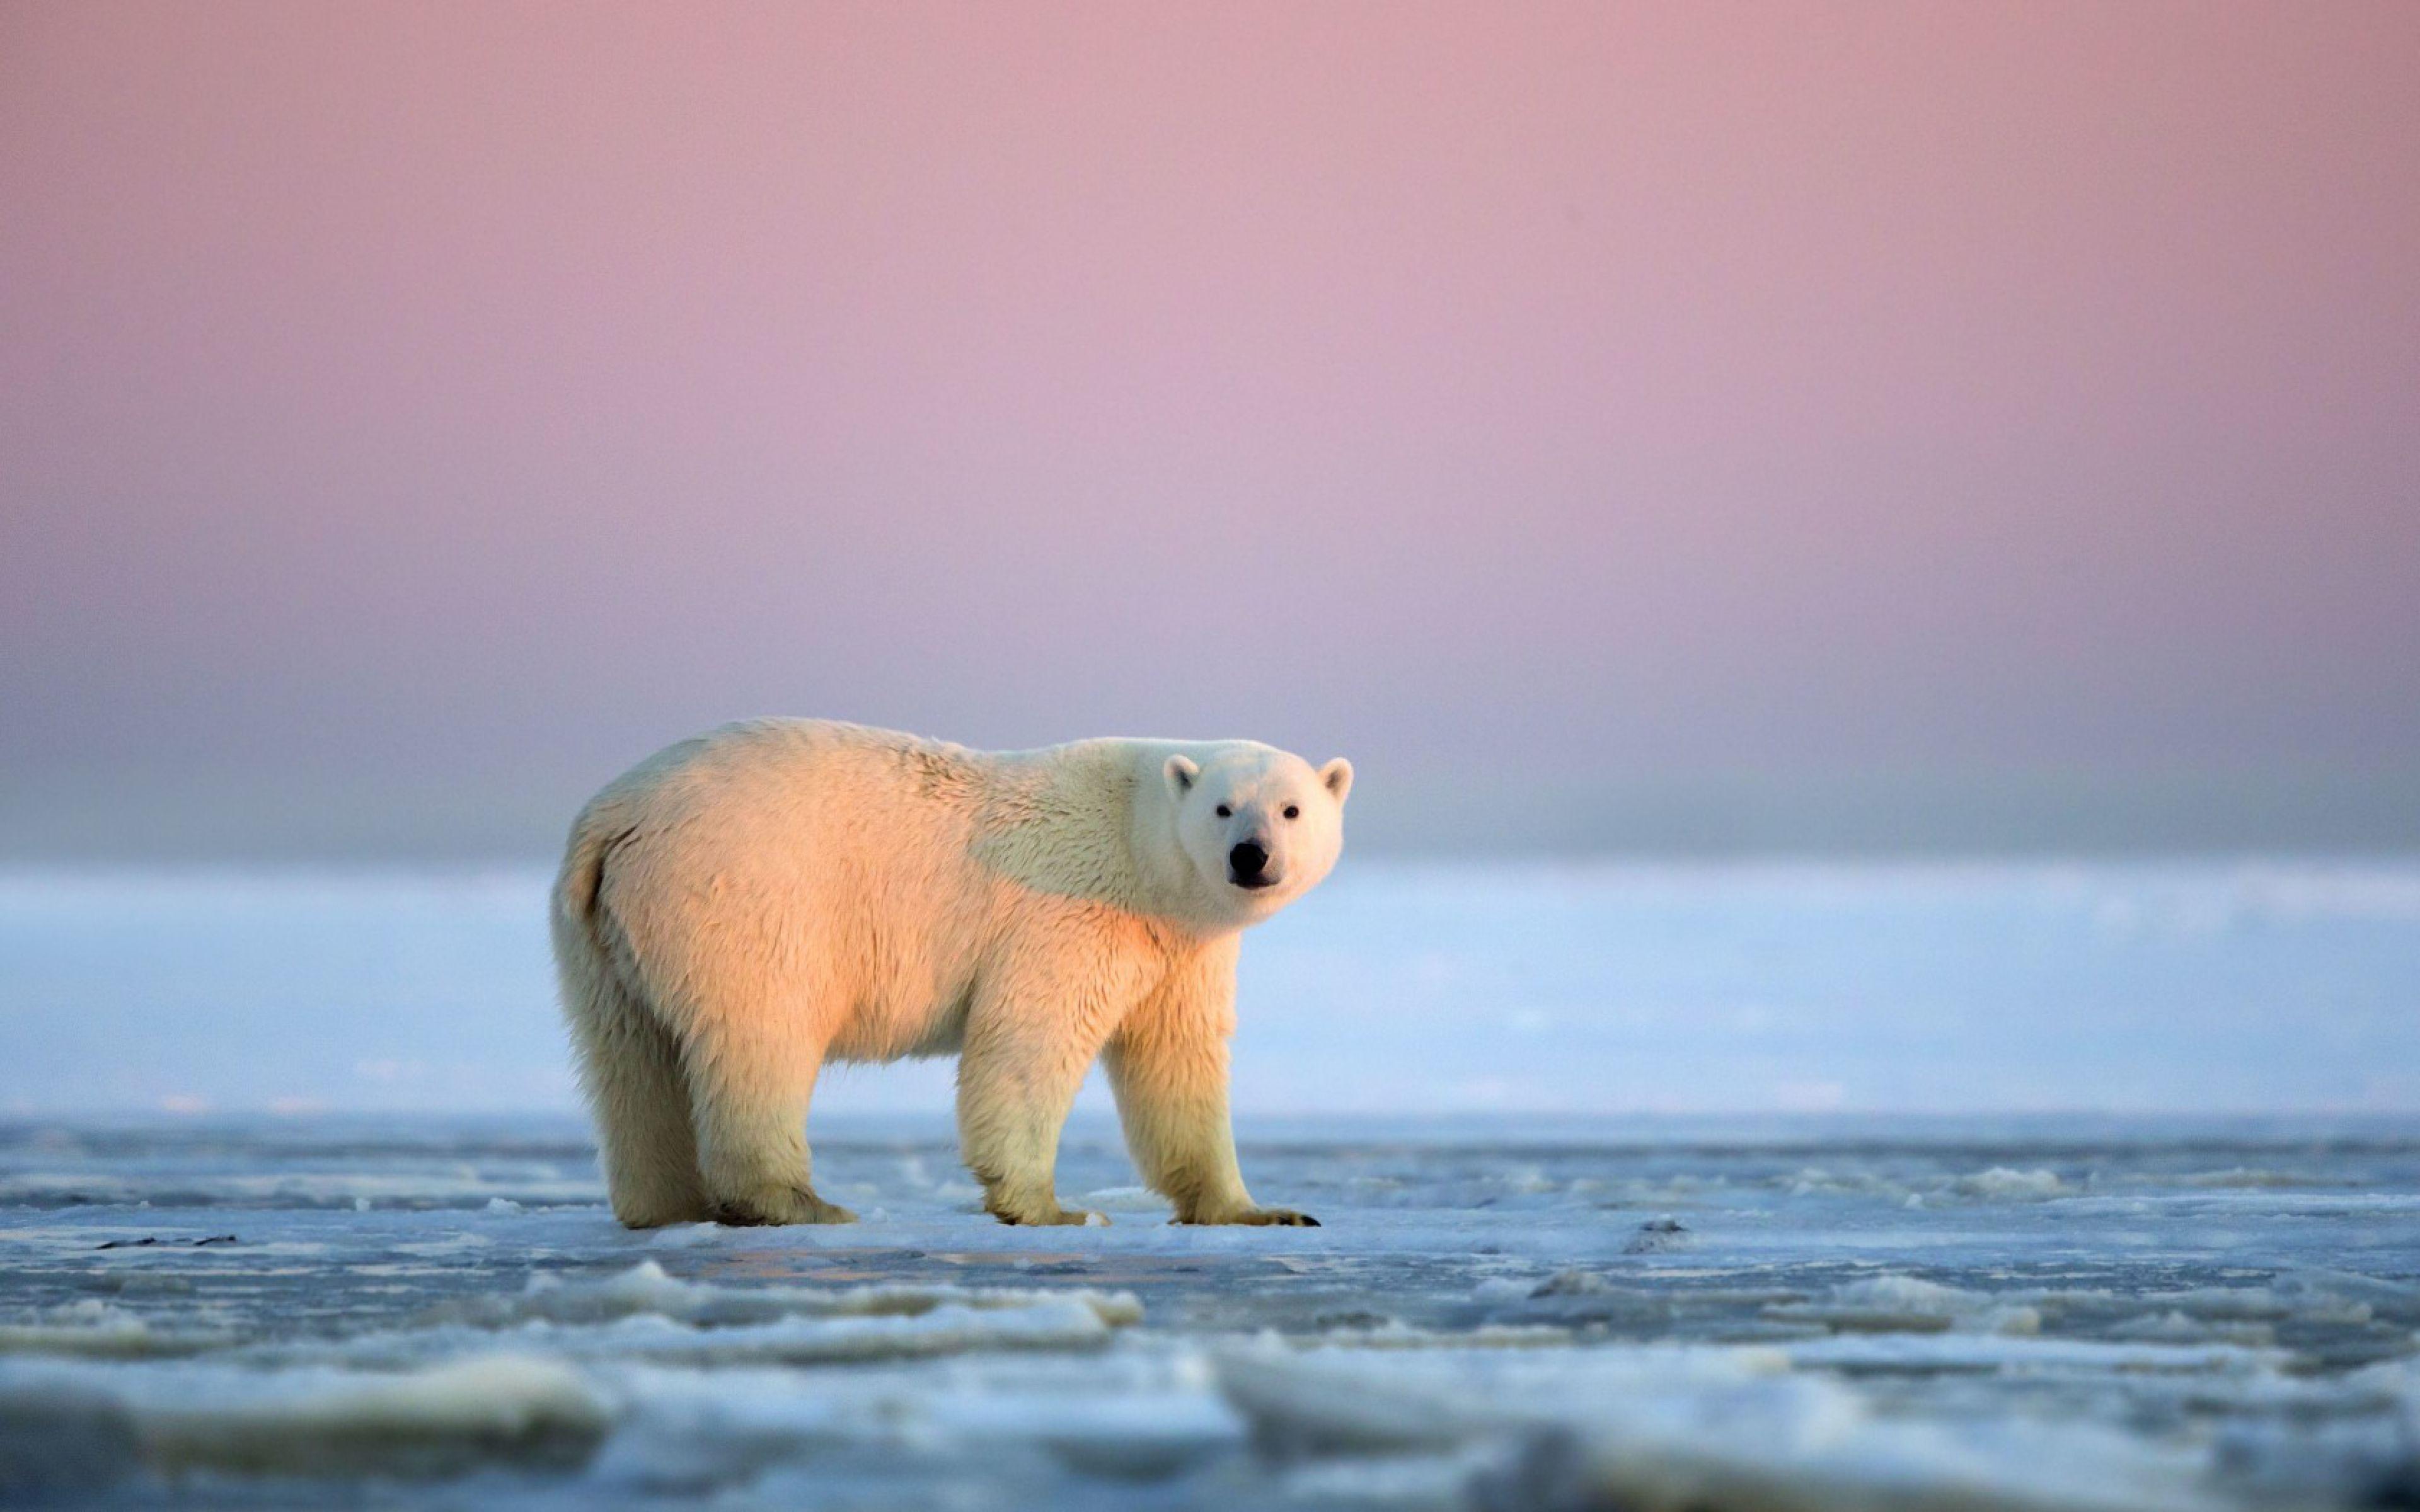 Polar Bear Snow Antarctica Ice Sky White Hd Background Wallpaper Wallpapersbyte Polar Bear Animal Wallpaper Bear Animal polar bears on ice wallpapers hd